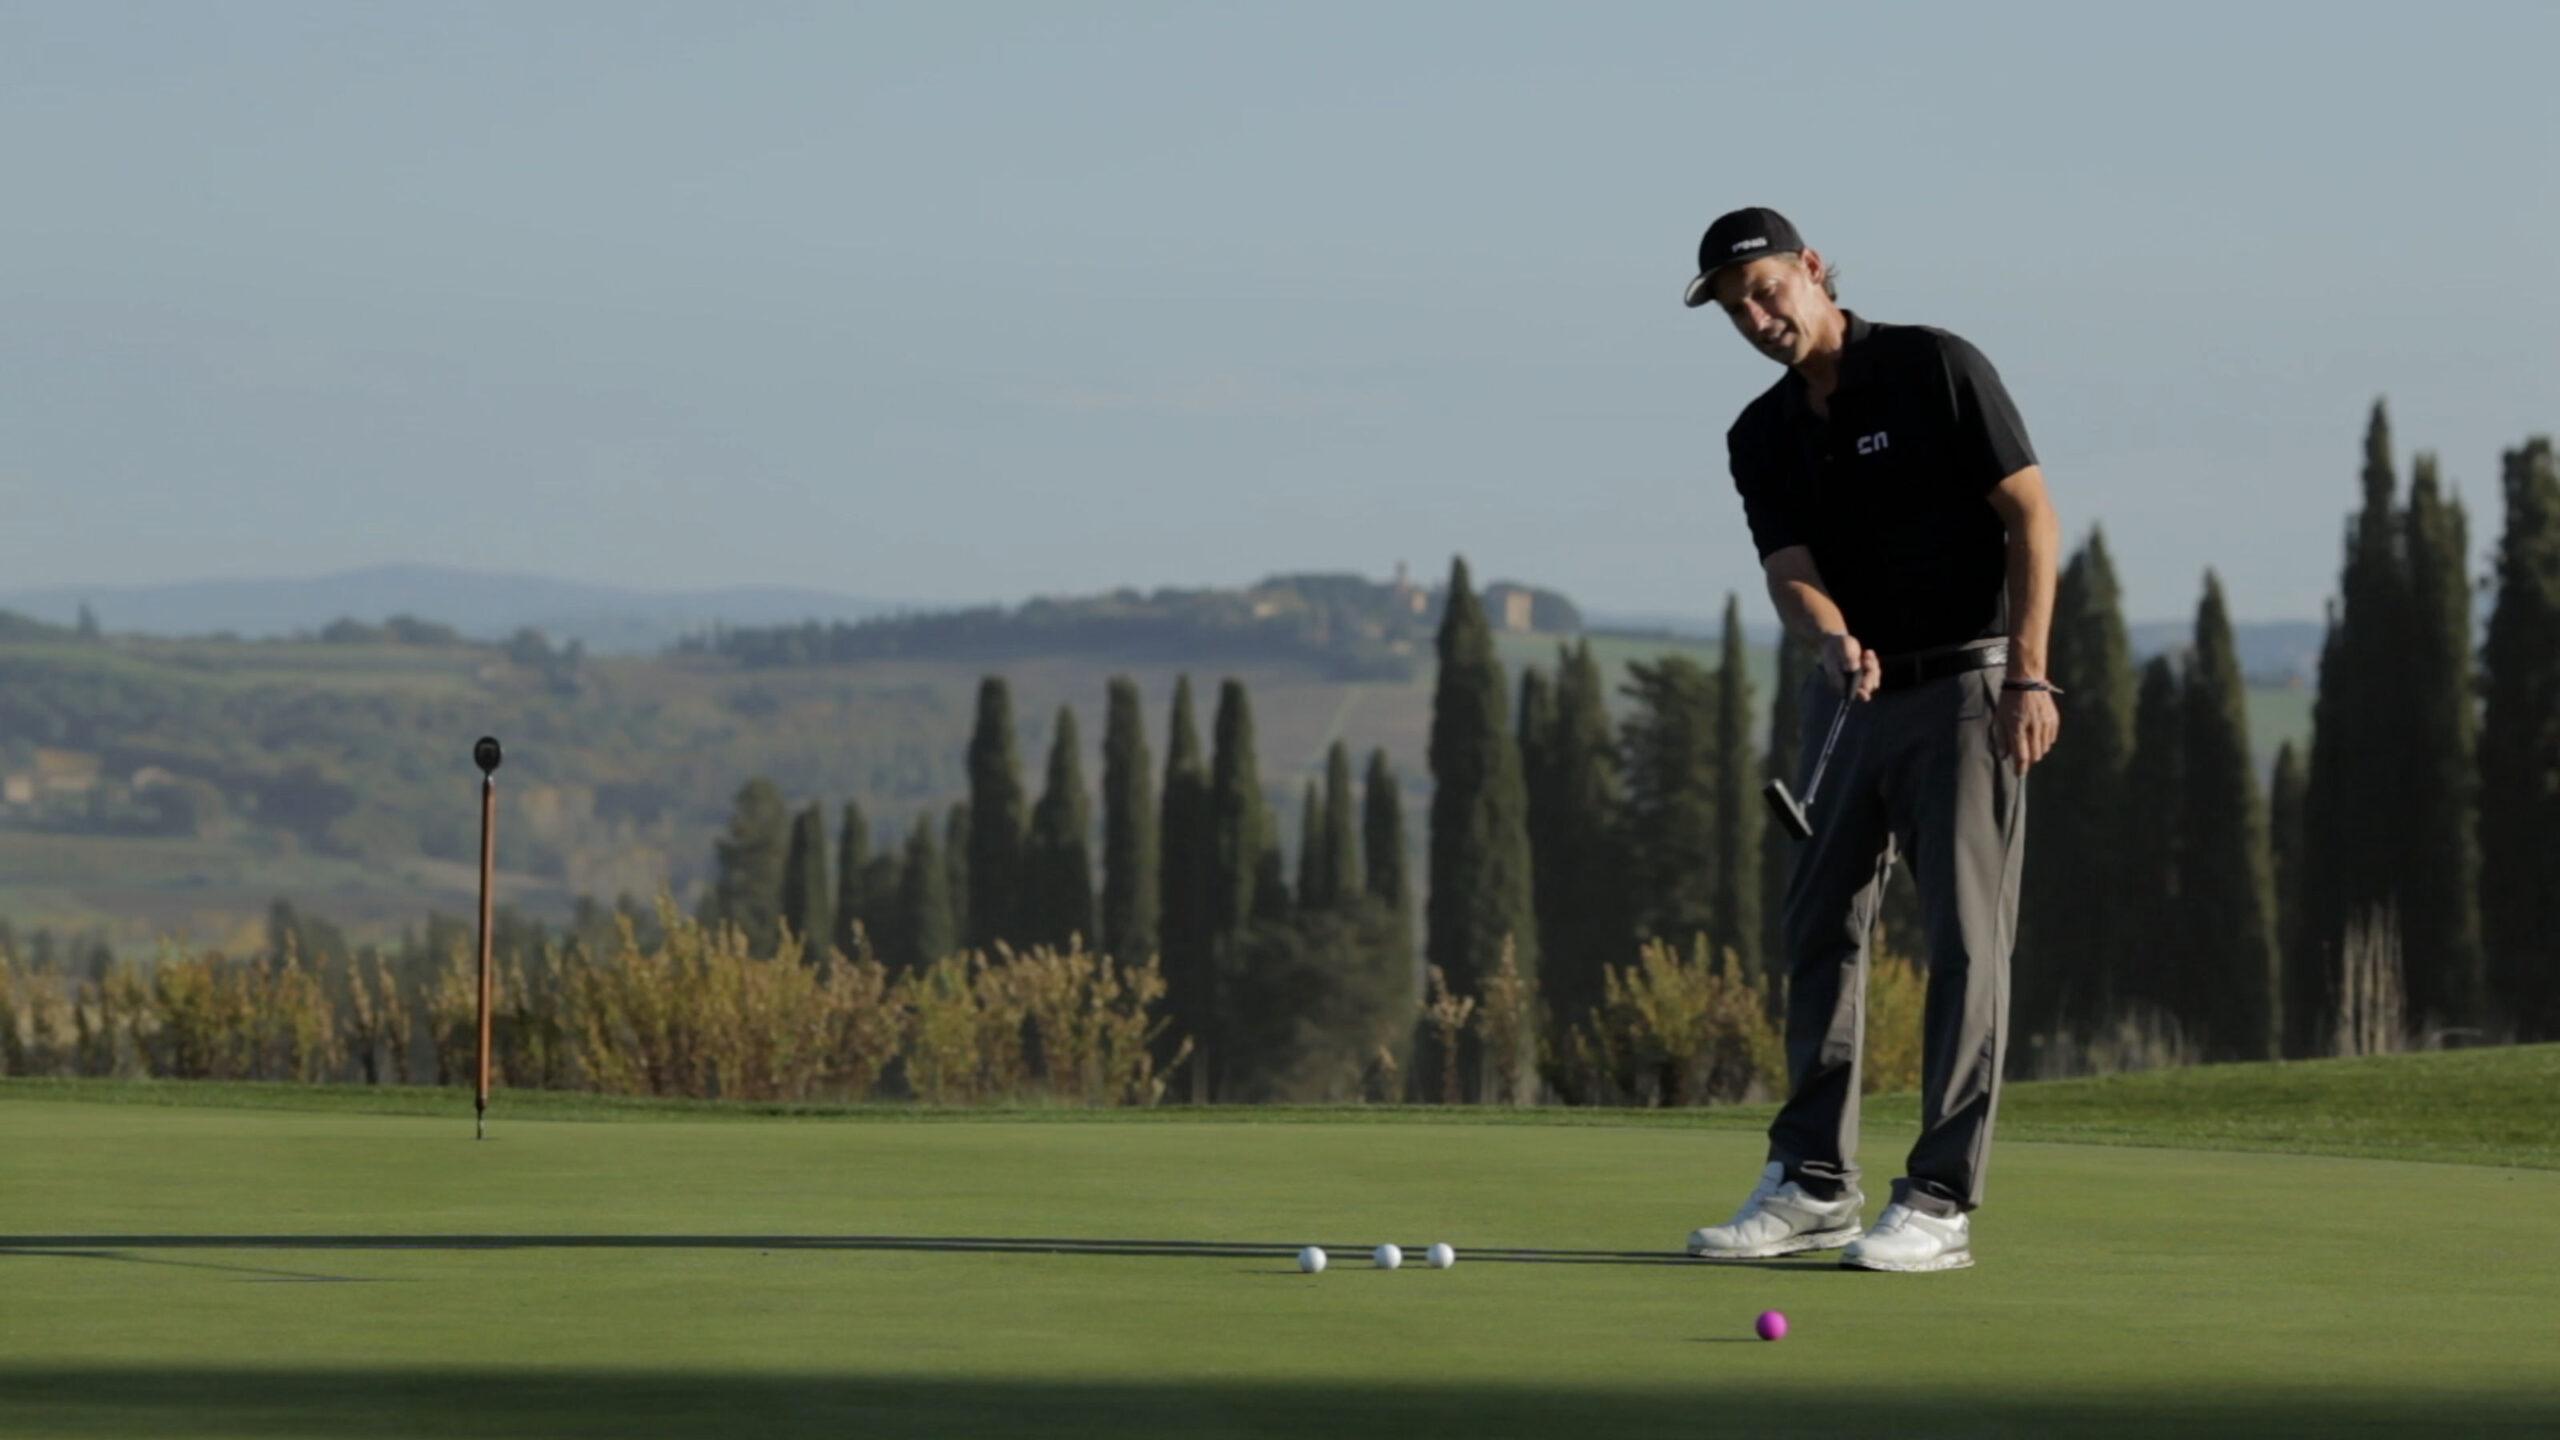 Golf Jugend – Trainingsspiele